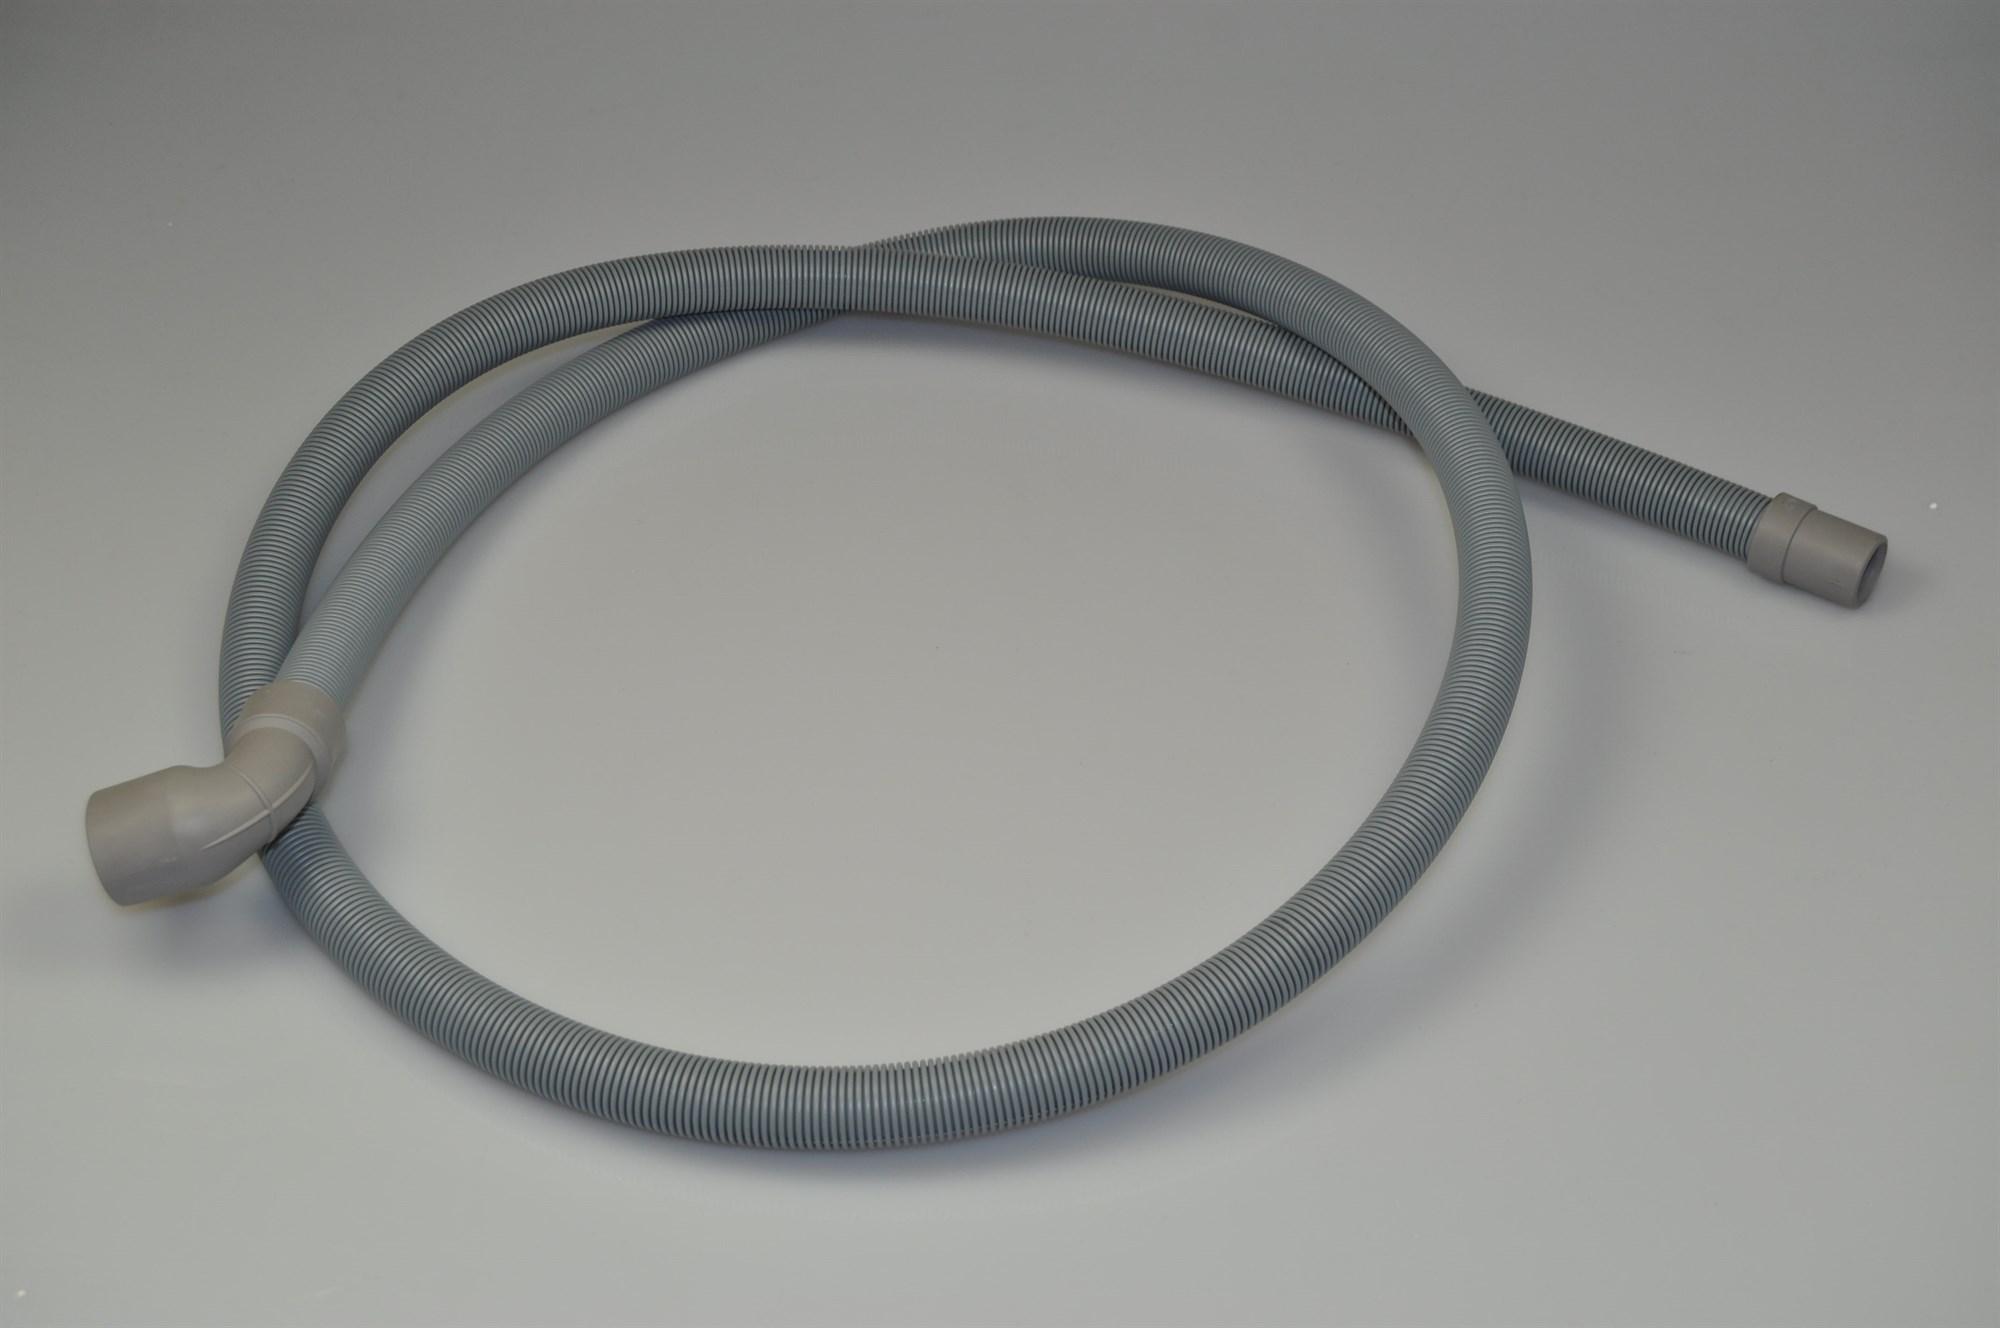 tuyau de vidange whirlpool lave vaisselle 2000 mm. Black Bedroom Furniture Sets. Home Design Ideas